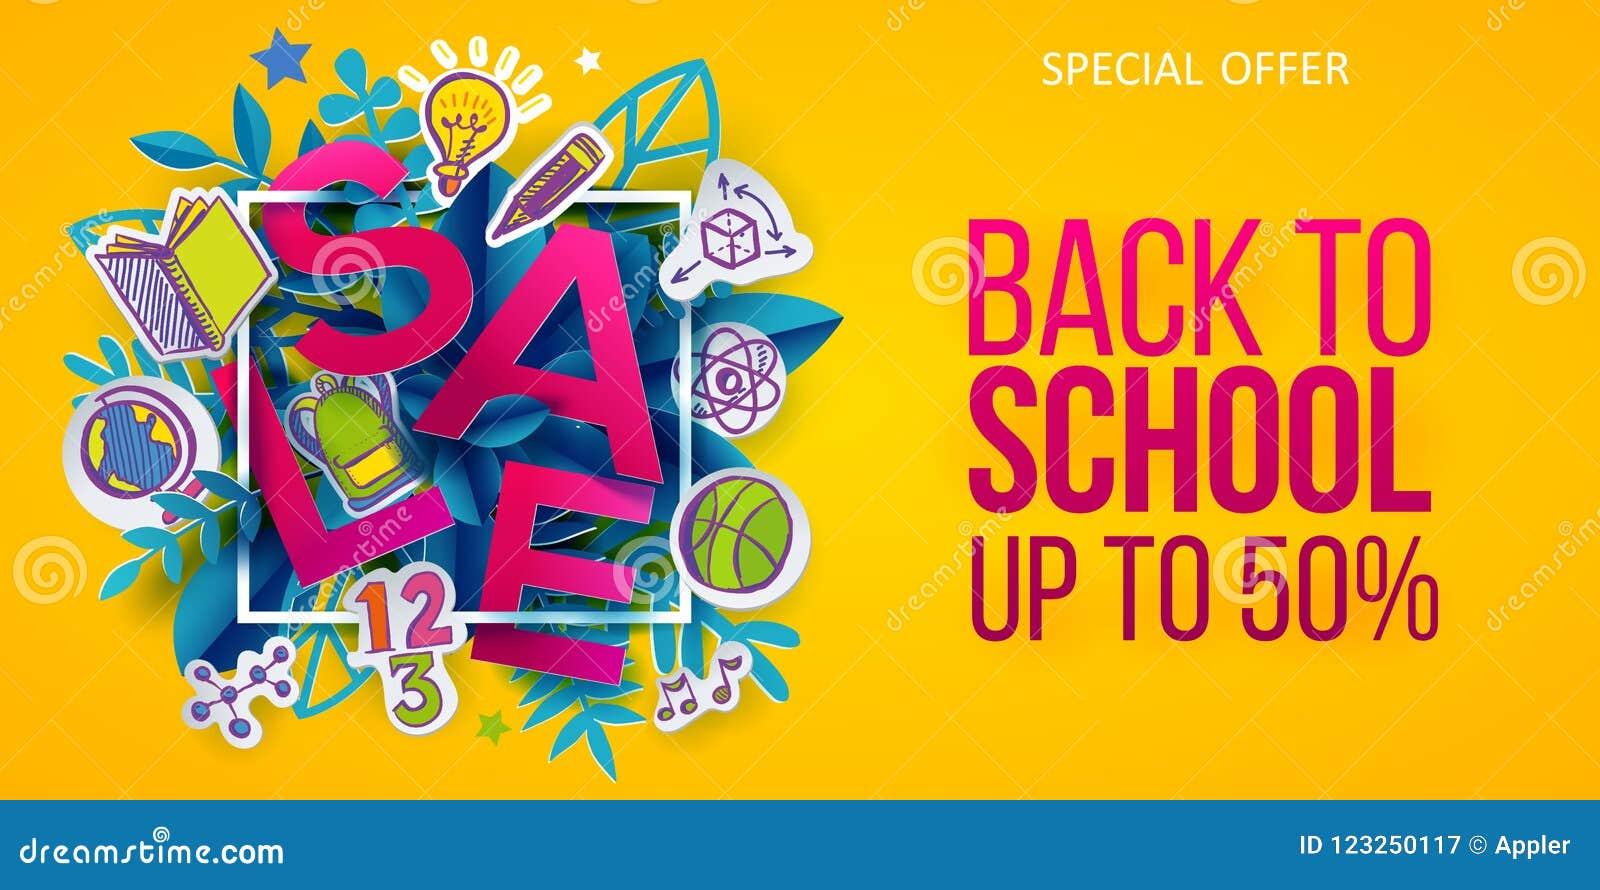 Back To School Sale Banner Offer Stock Vector - Illustration of